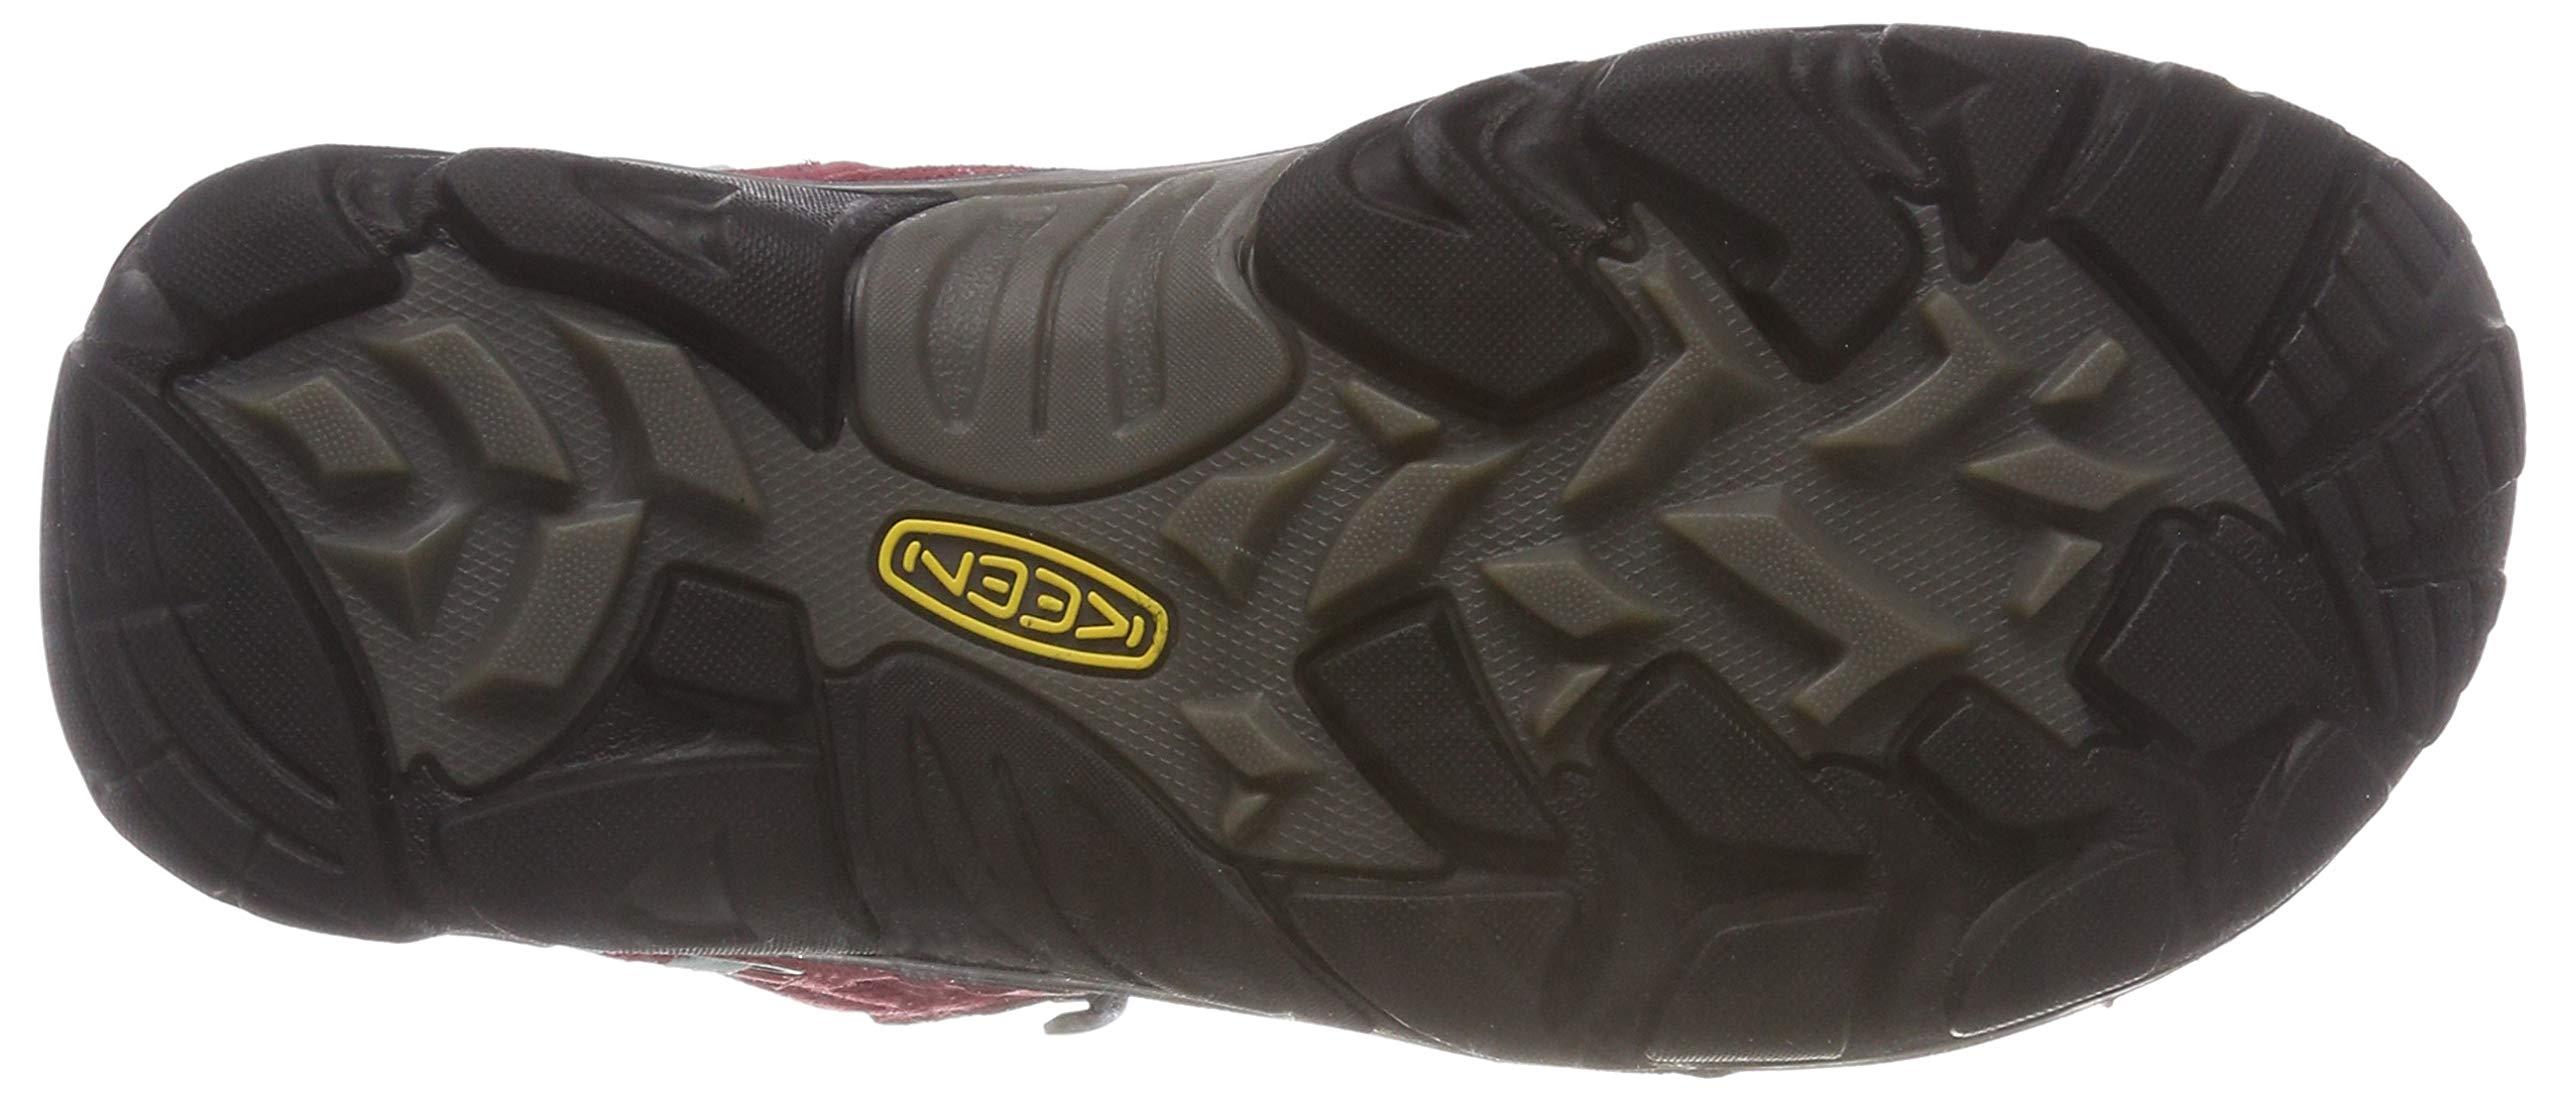 KEEN Women's Wanderer Waterproof Mid High Rise Hiking Shoes, 8.5 UK 3